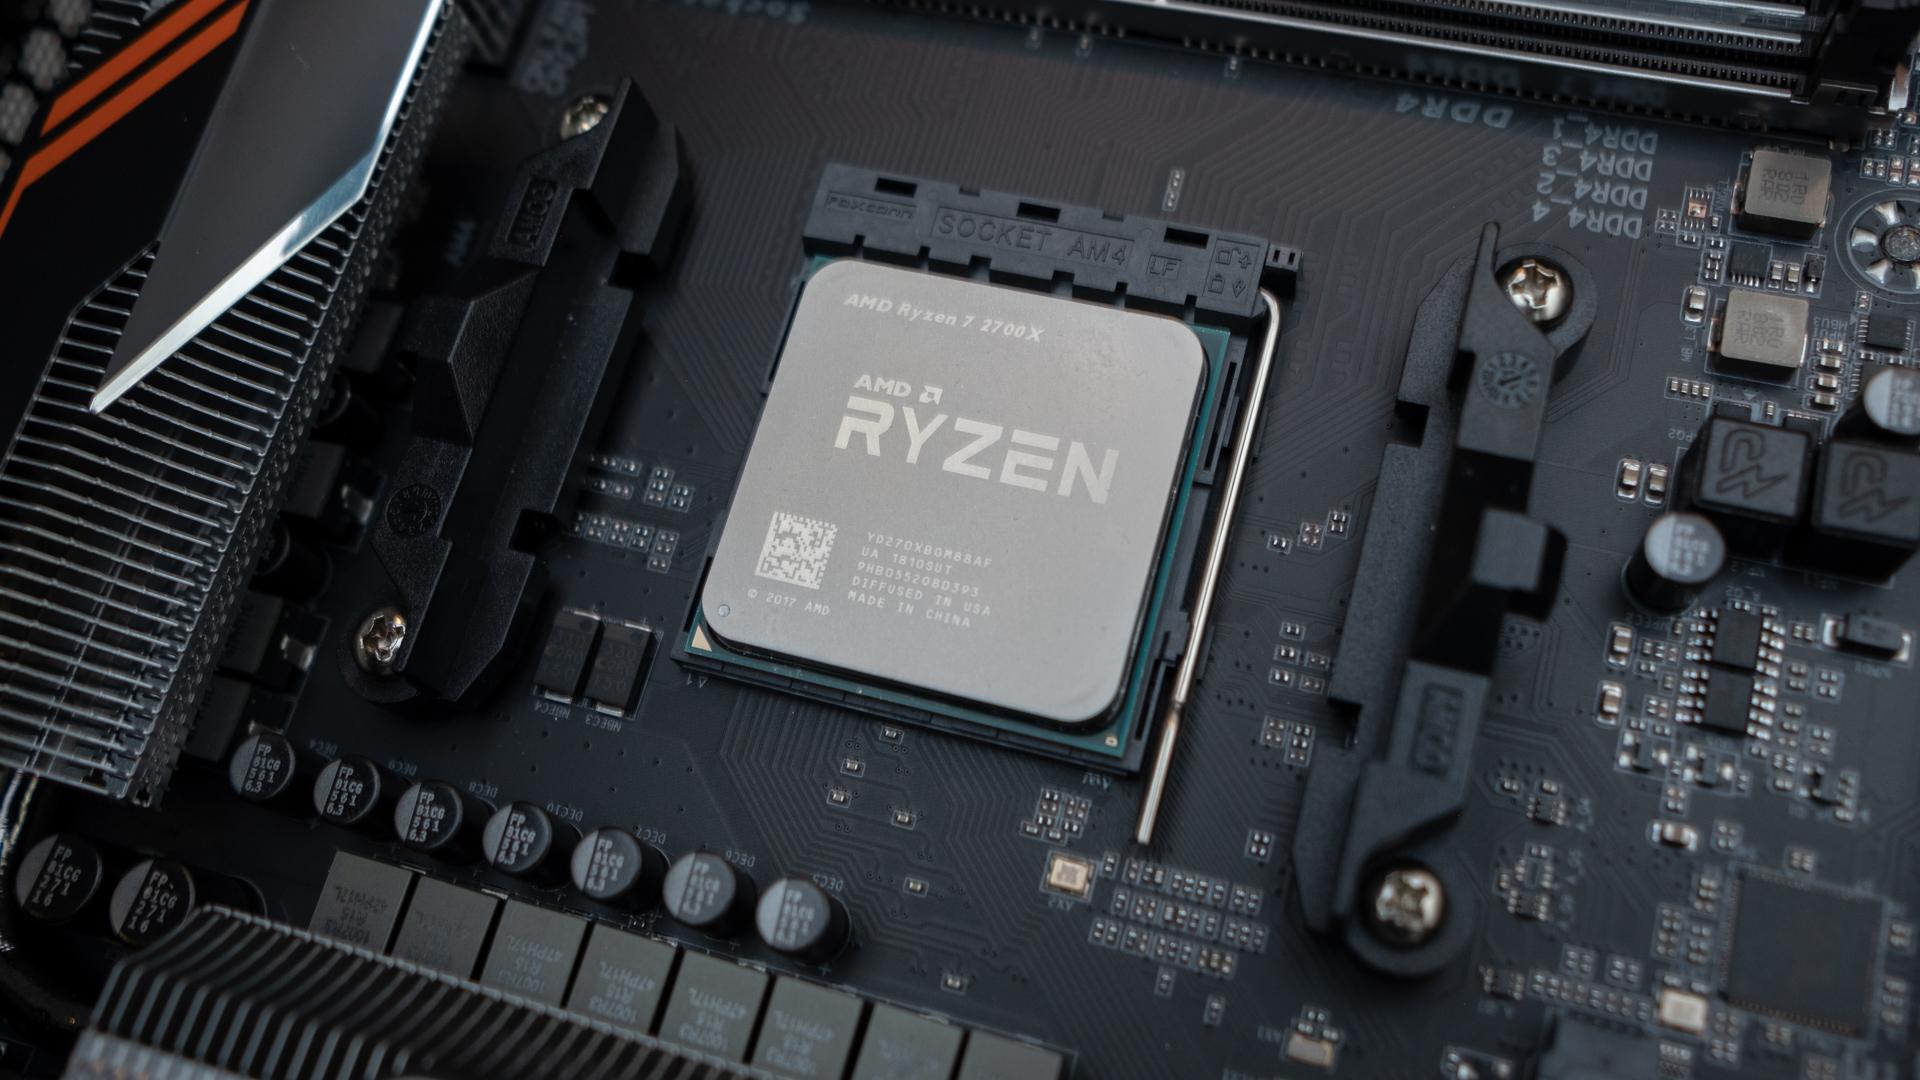 You Can Get The Amd Ryzen 7 2700x For Under 200 Ahead Of Black Friday Techradar